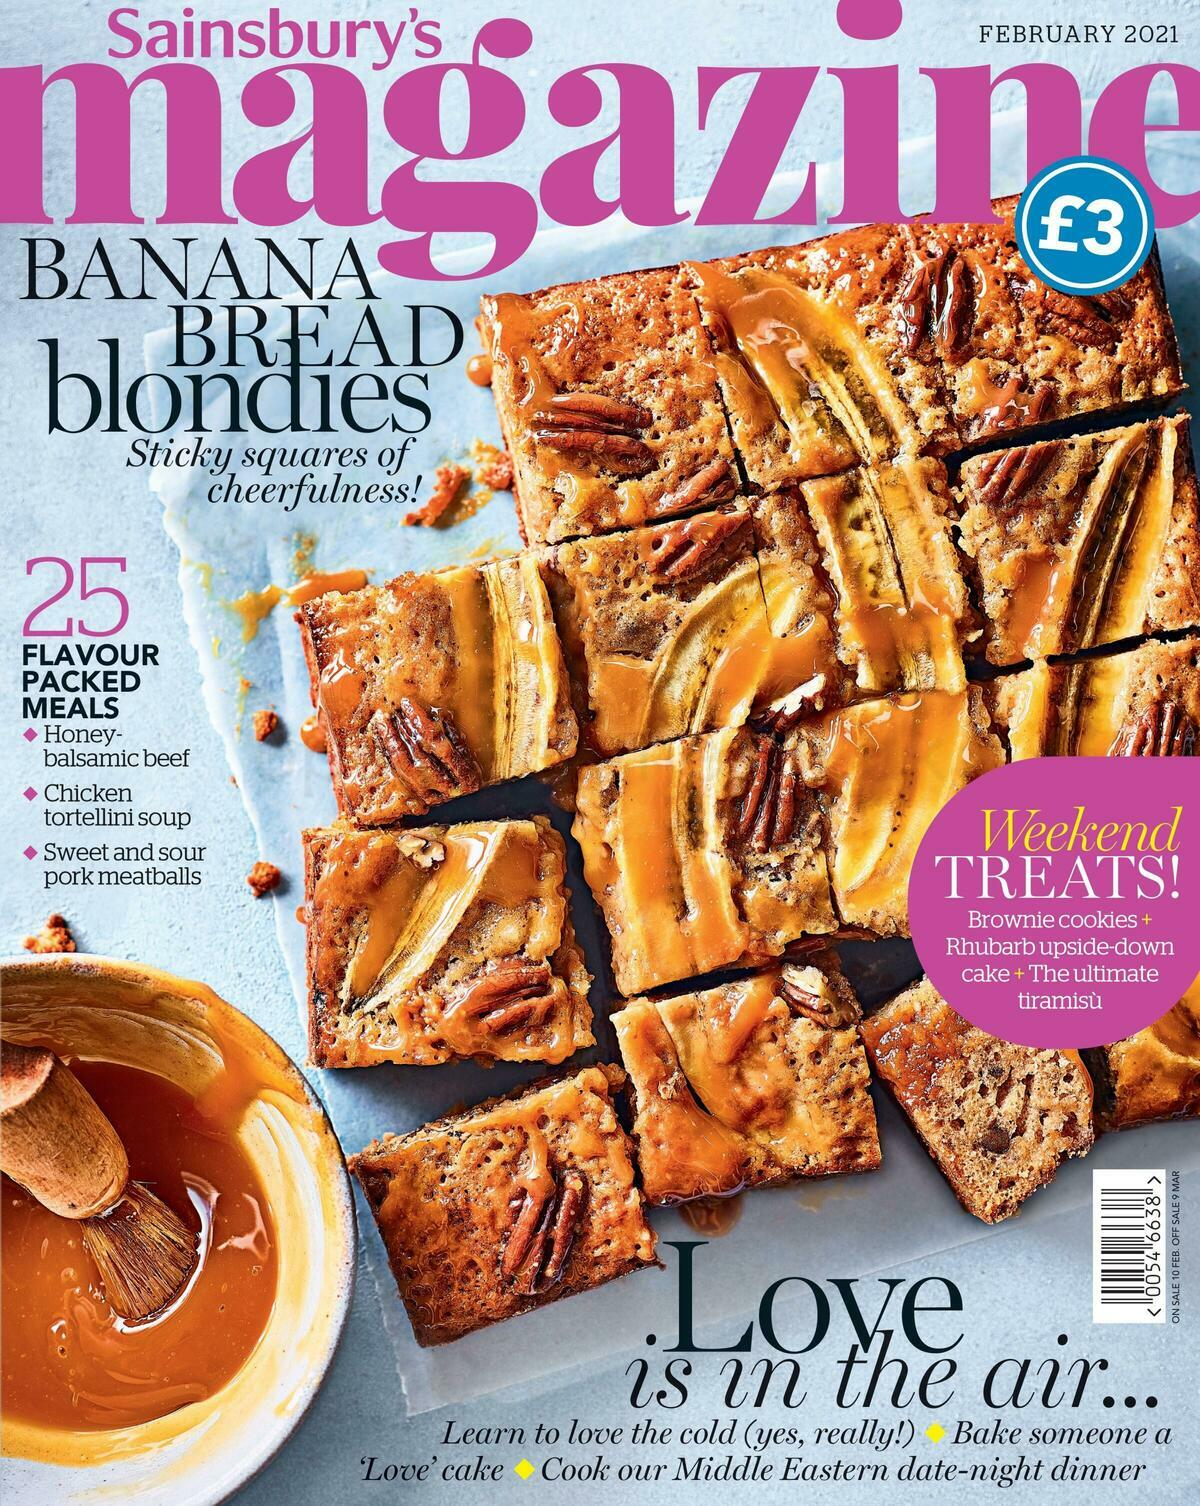 Sainsbury's Magazine February Offers from February 1